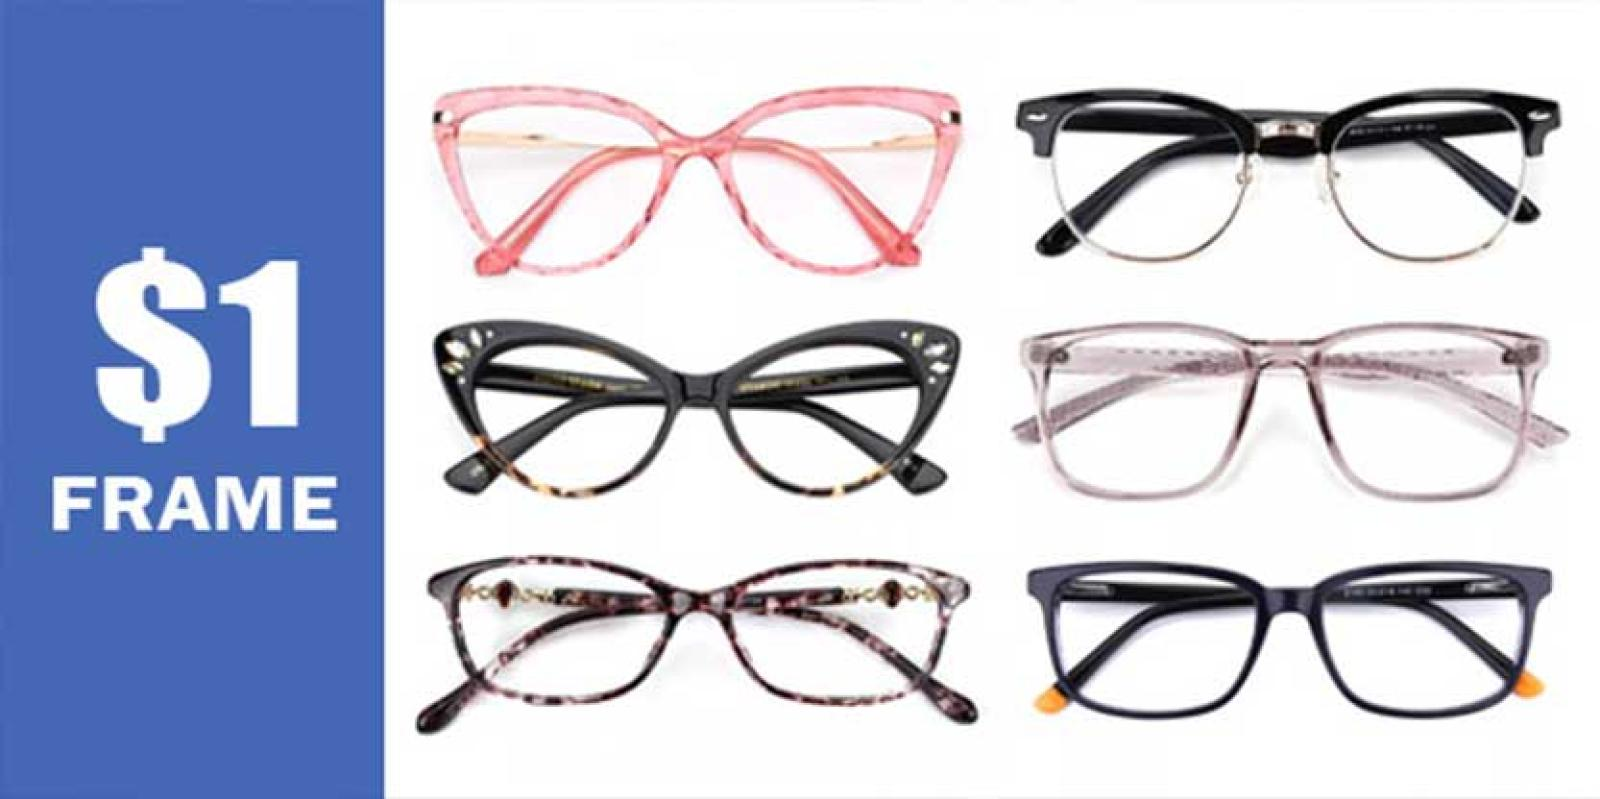 1.50 Digital Free Form Progressive (No-line multi-focal)-Translucent---Eyeglasses-additional3